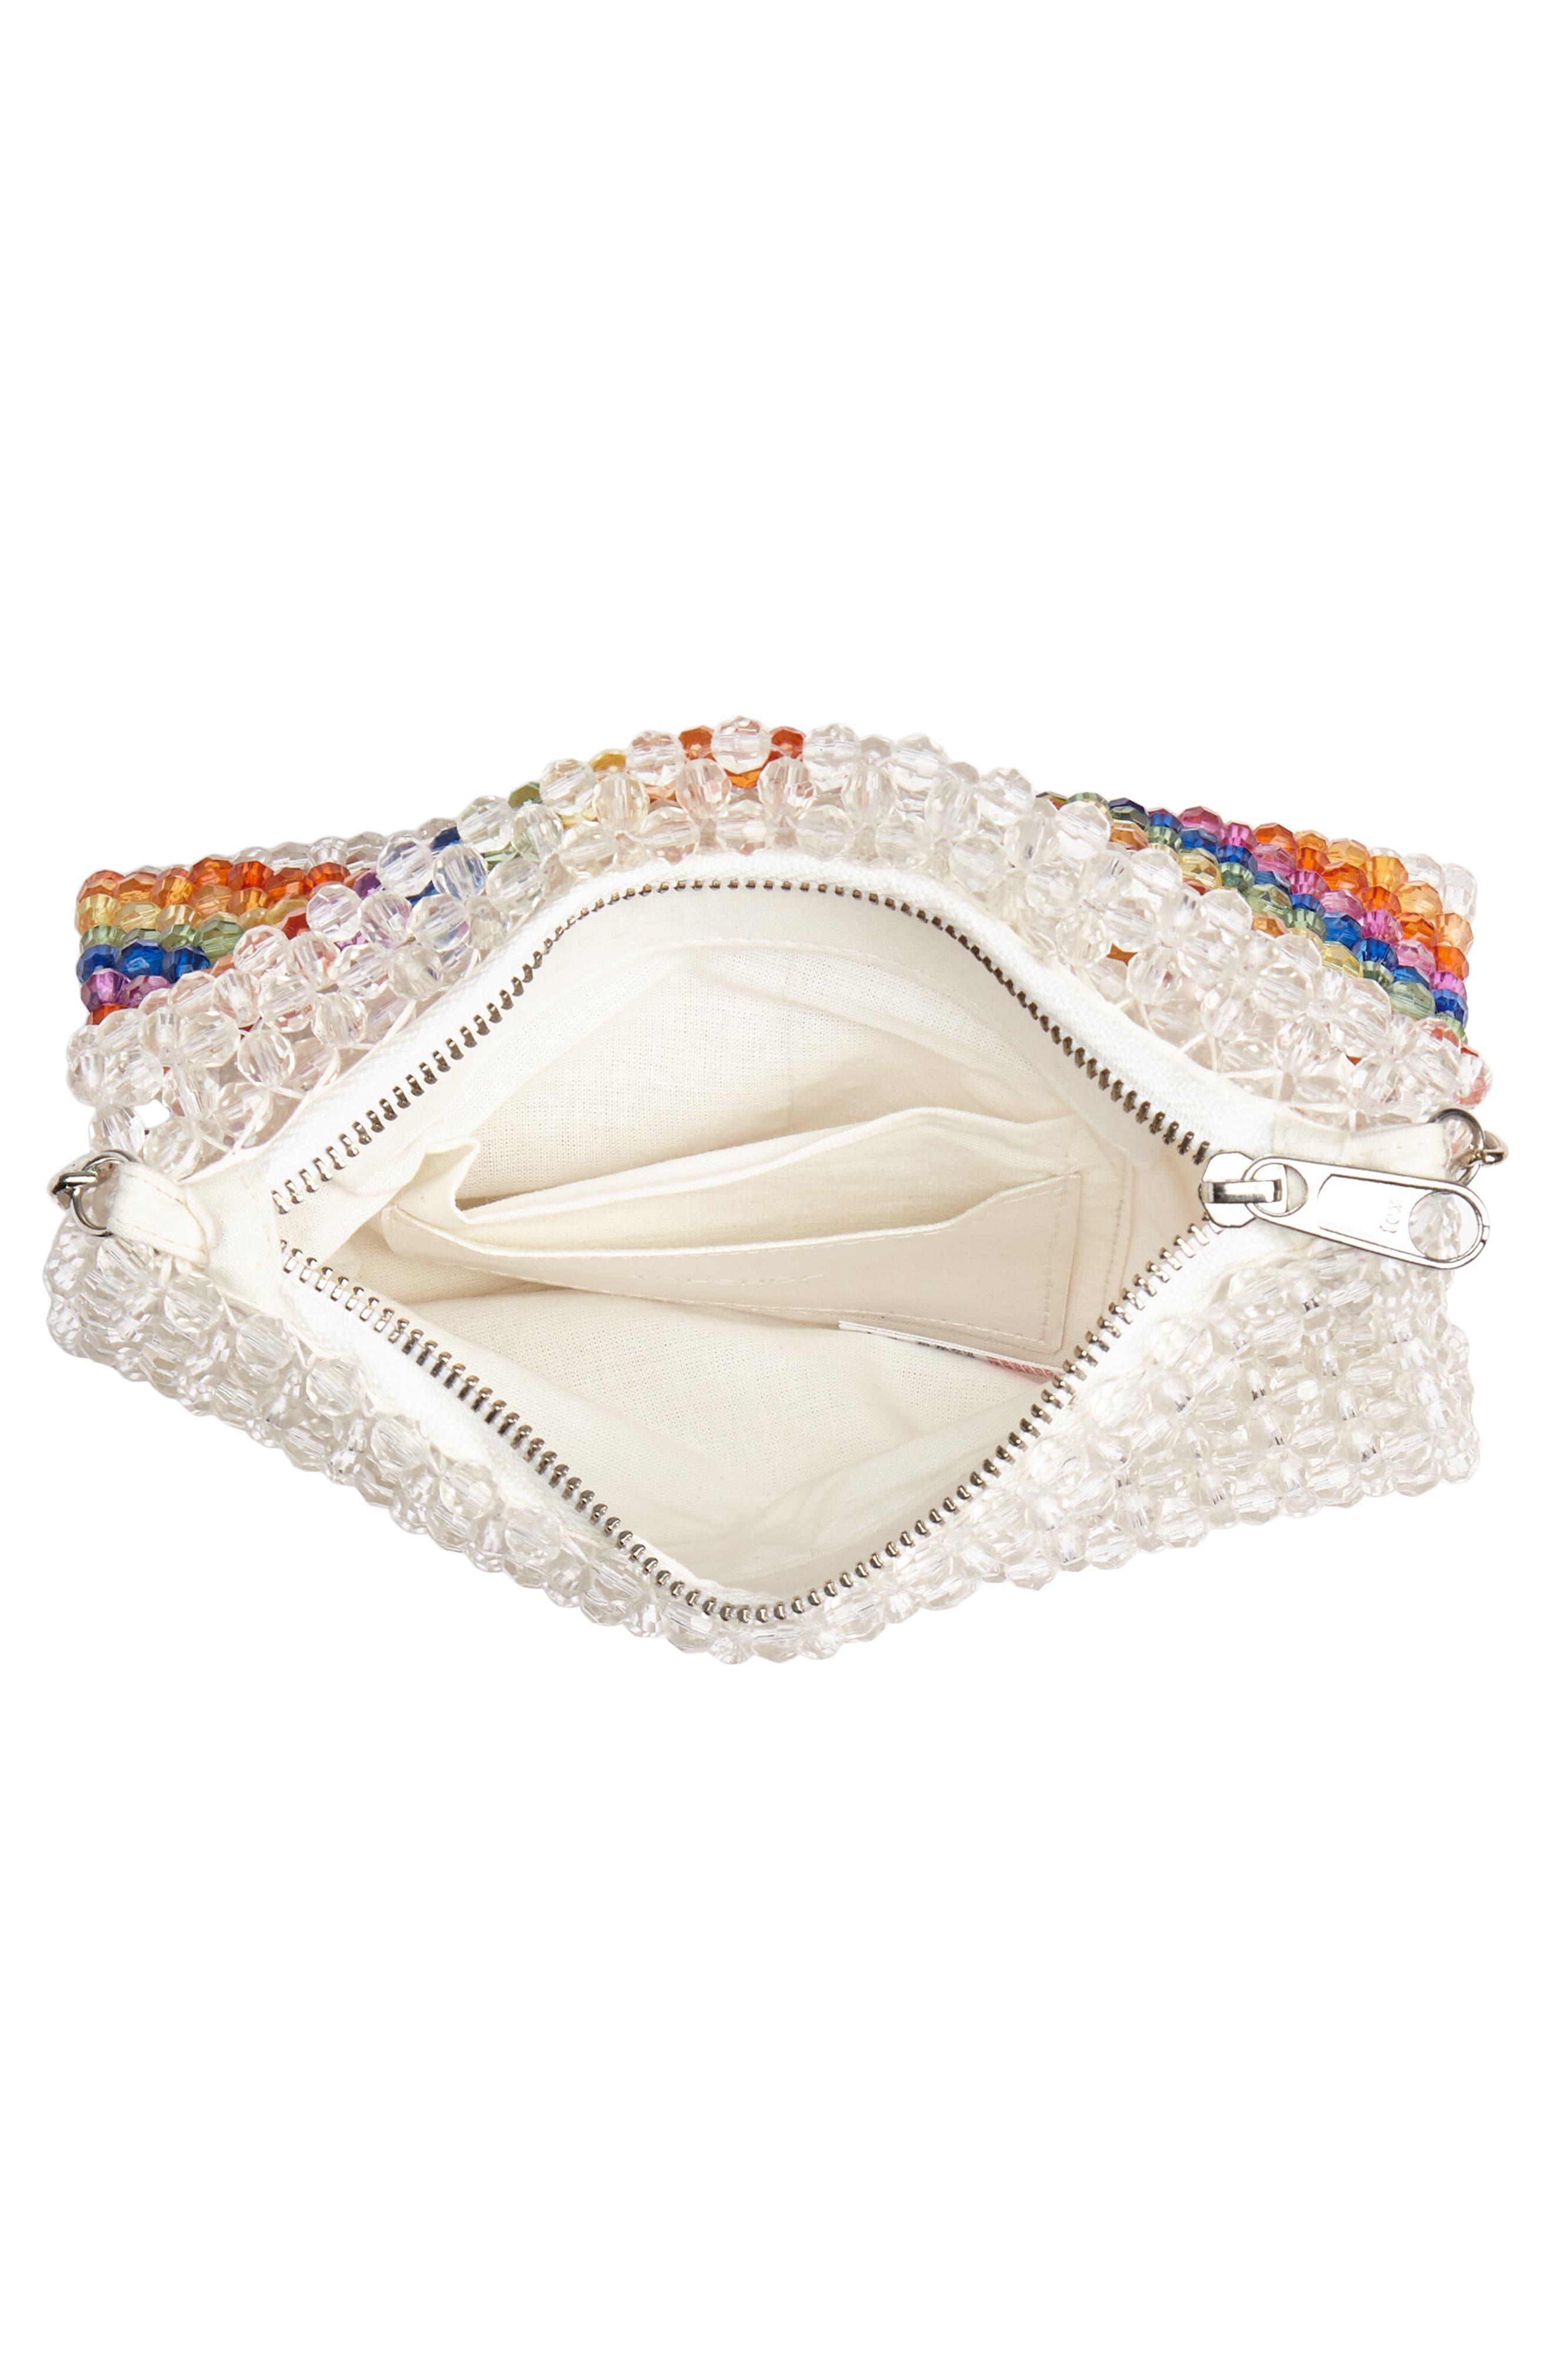 Zizi Beaded Rainbow Shoulder Bag,                             Alternate thumbnail 4, color,                             100